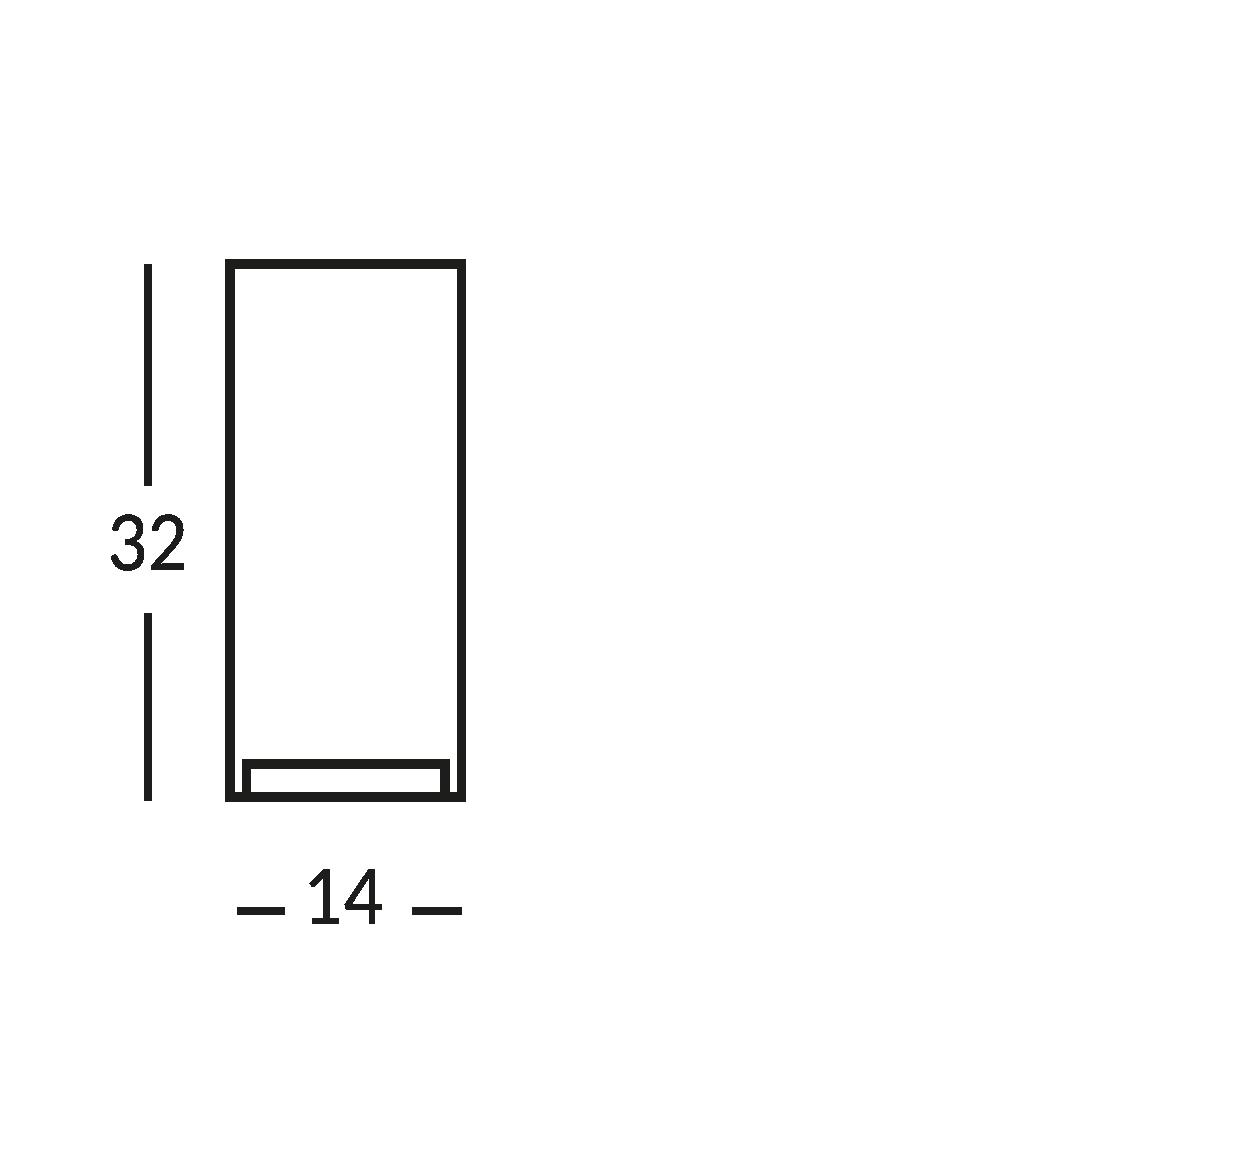 Señal impresa en cristal transparente. cm 14x32